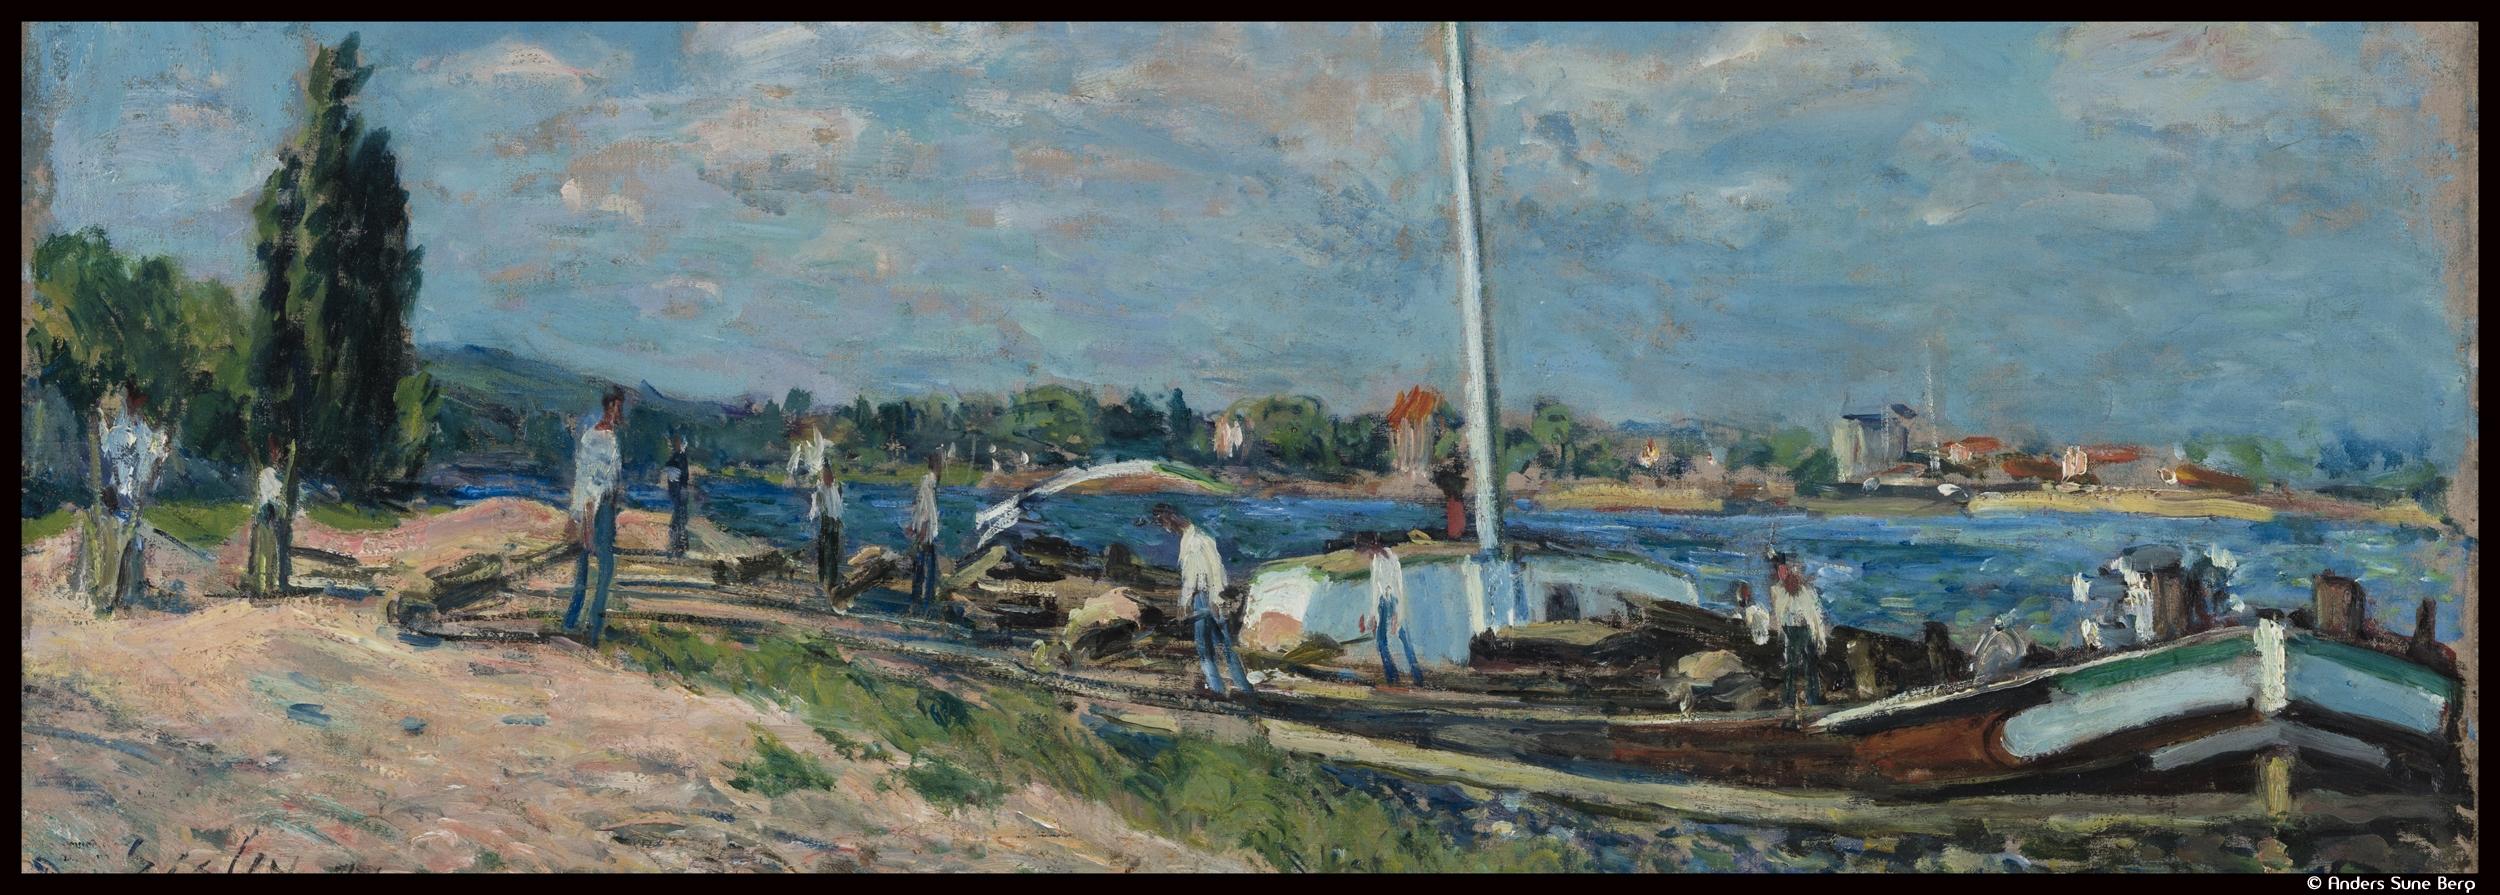 Couv_7-Sisley dechargement peniches Billancourt 1877 Inv273 WH_©Anders Sune Berg_@loeildoliv